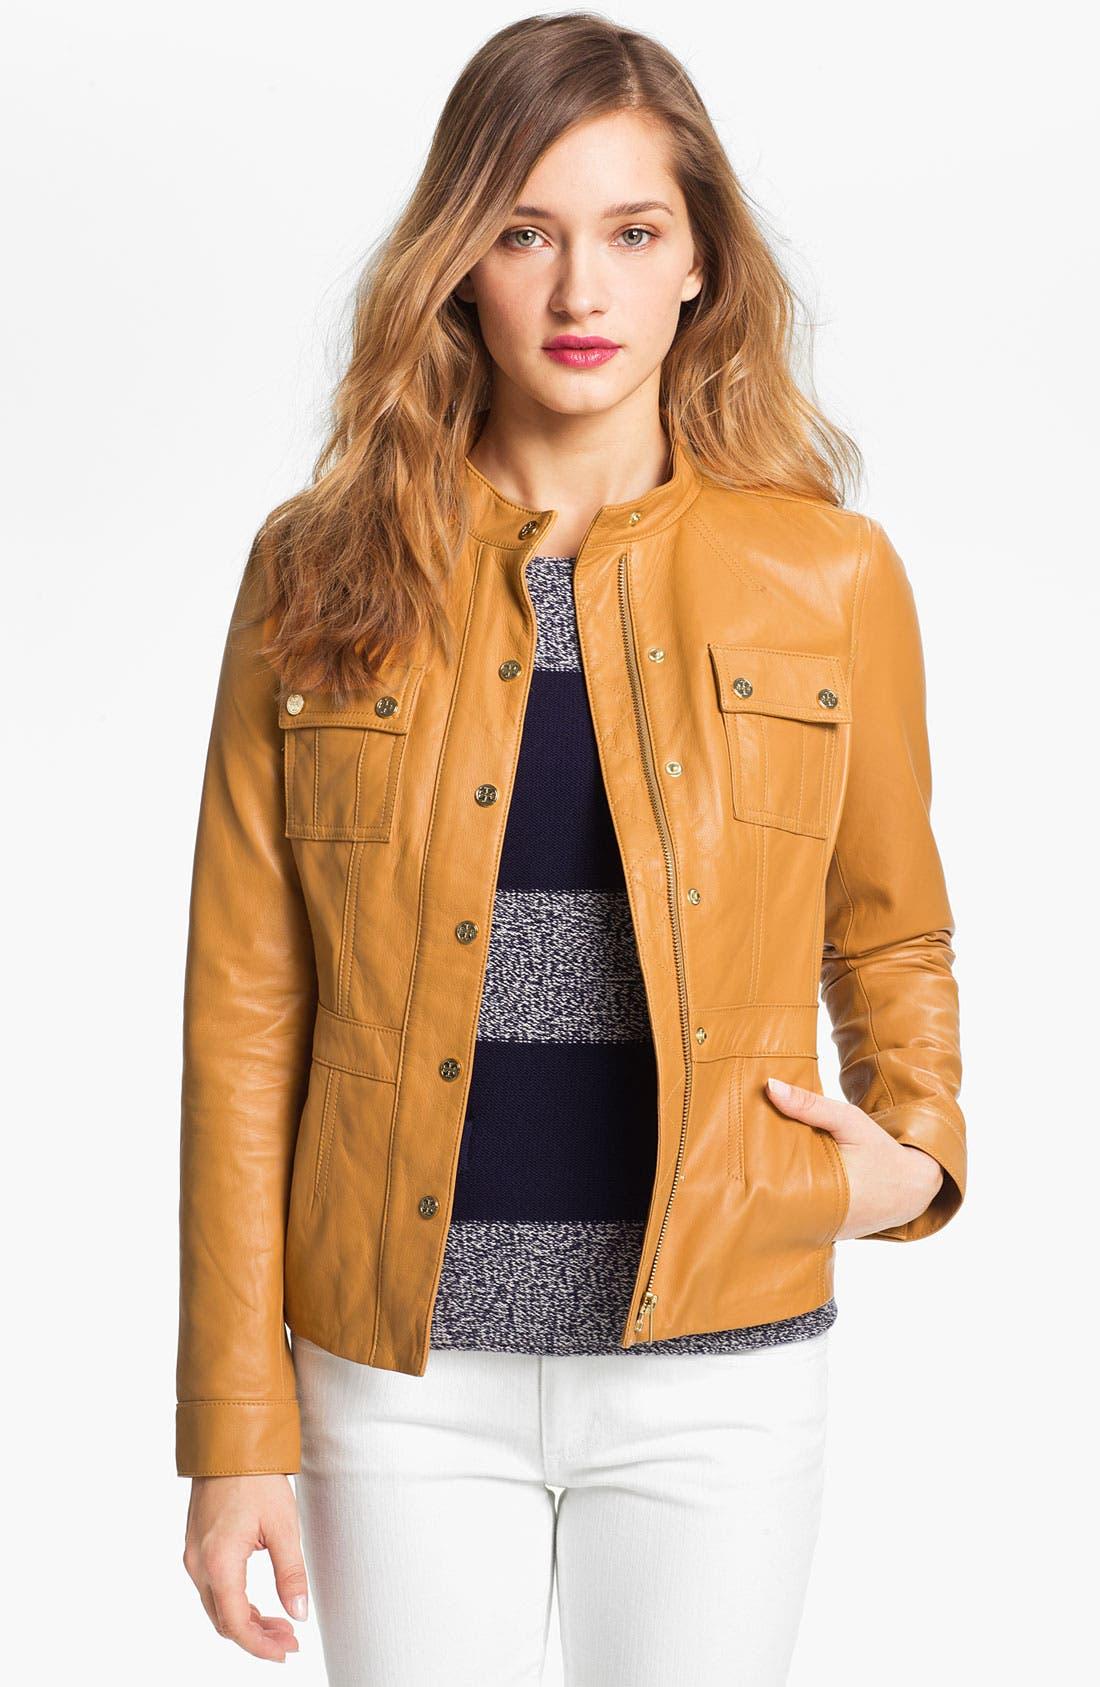 Main Image - Tory Burch 'Beacon' Leather Moto Jacket